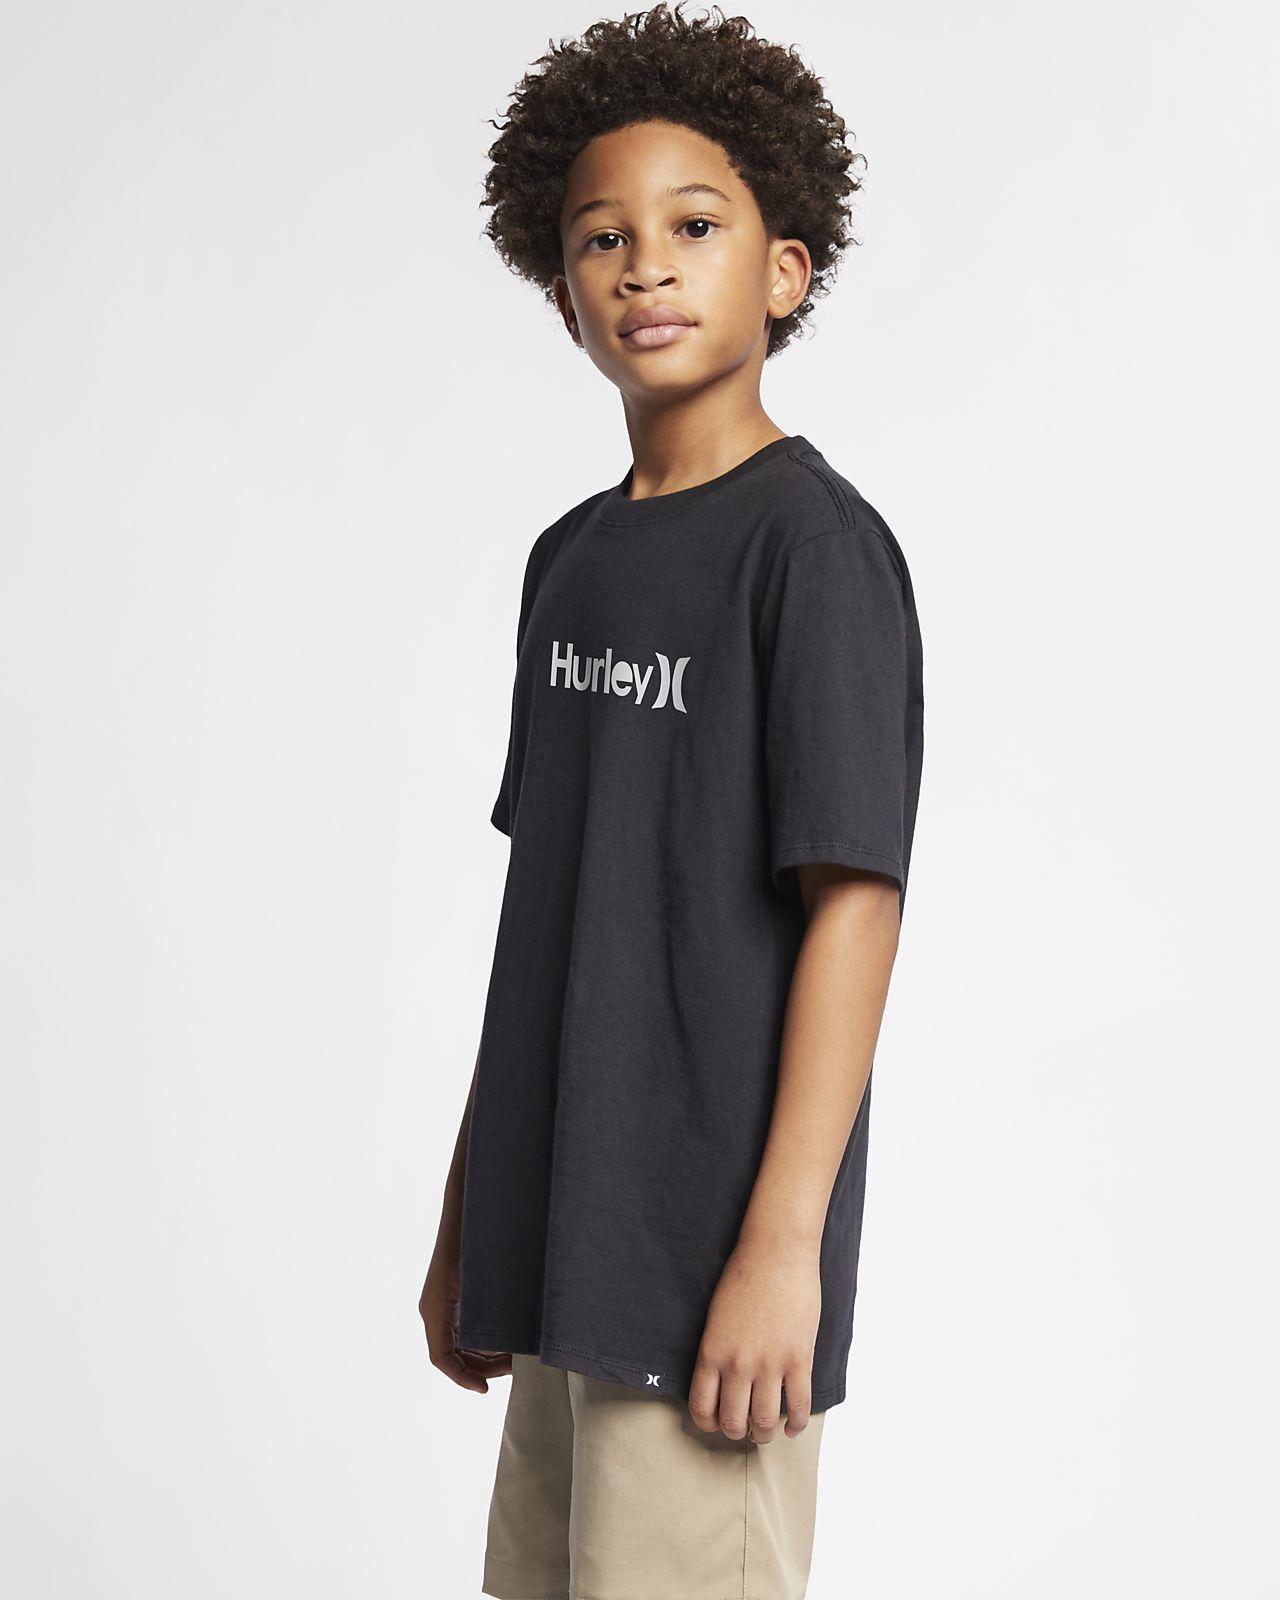 Hurley Premium One And Only Solid Erkek Çocuk Tişörtü